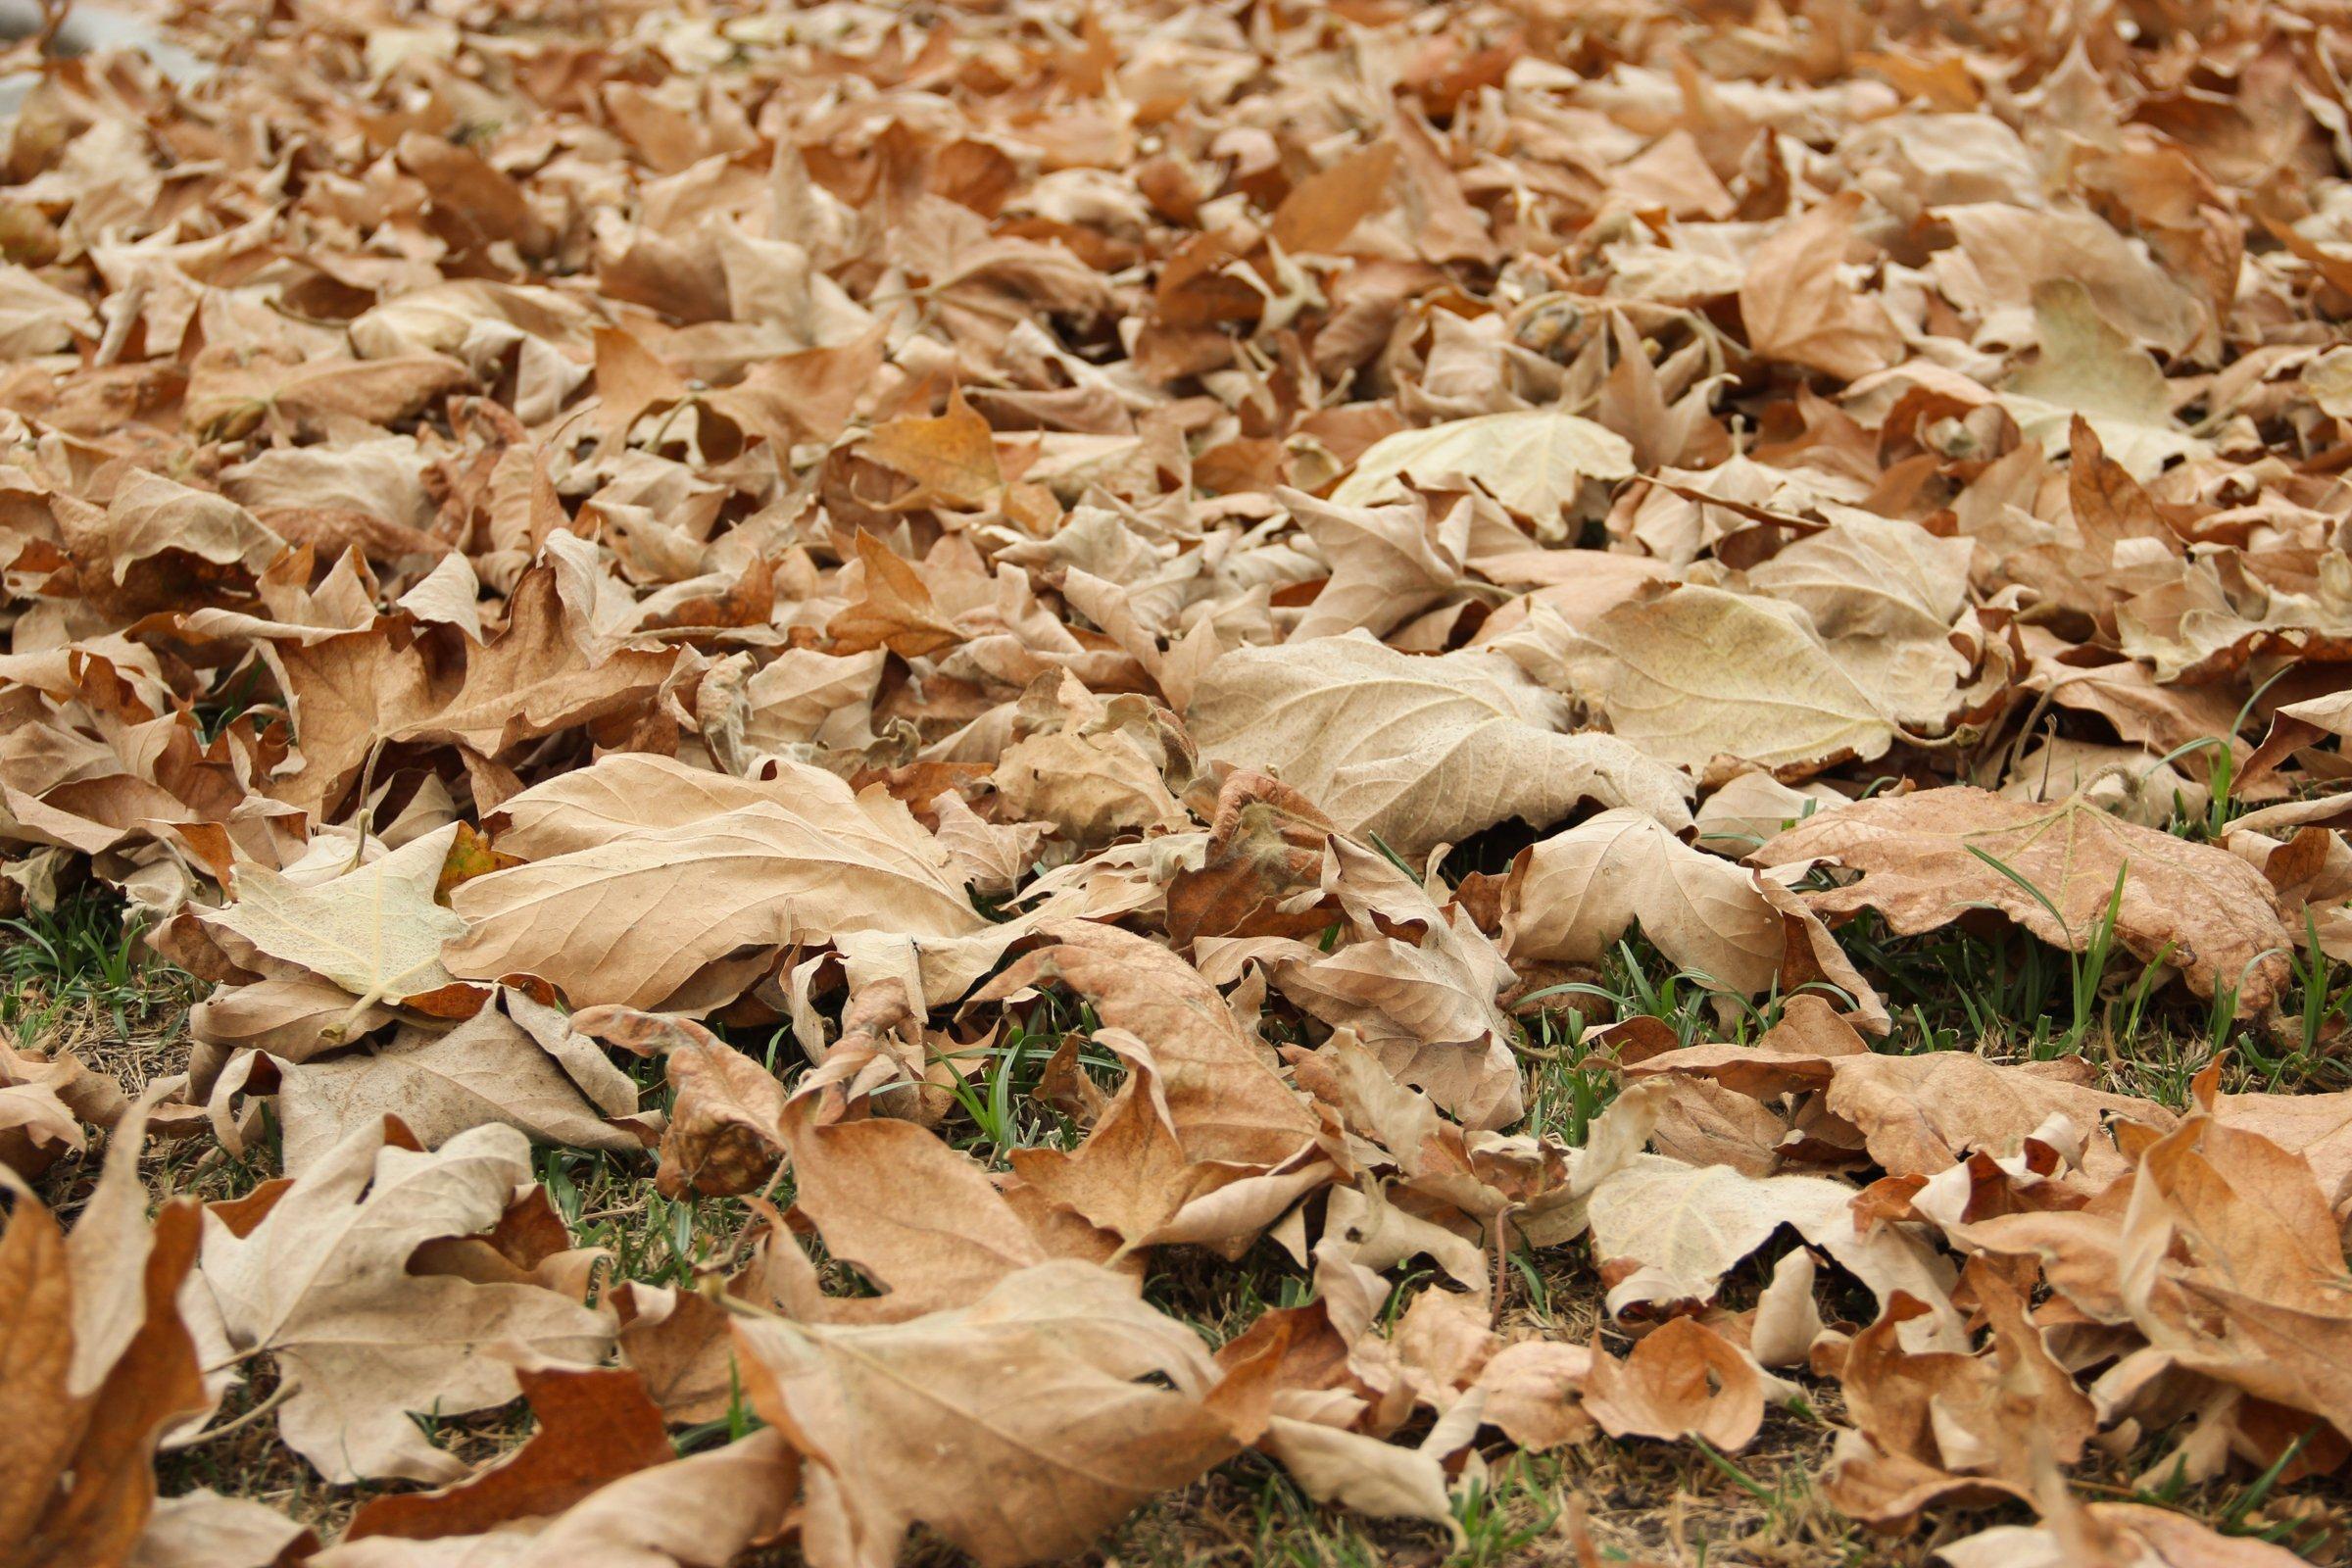 Fallen Dry Leaves On Grass